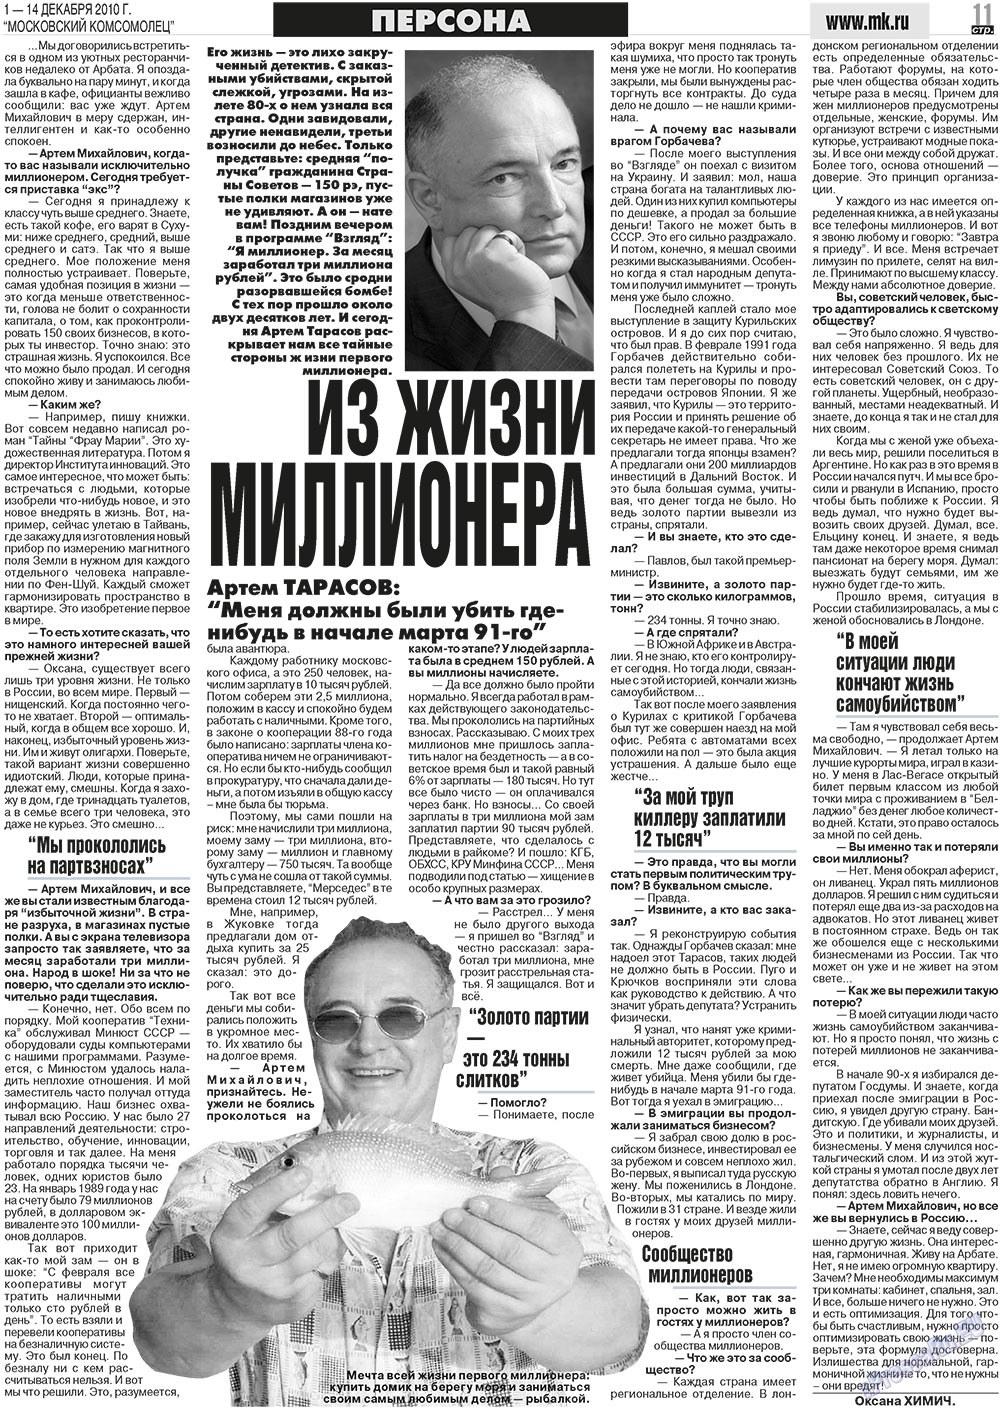 МК Испания (газета). 2010 год, номер 48, стр. 11